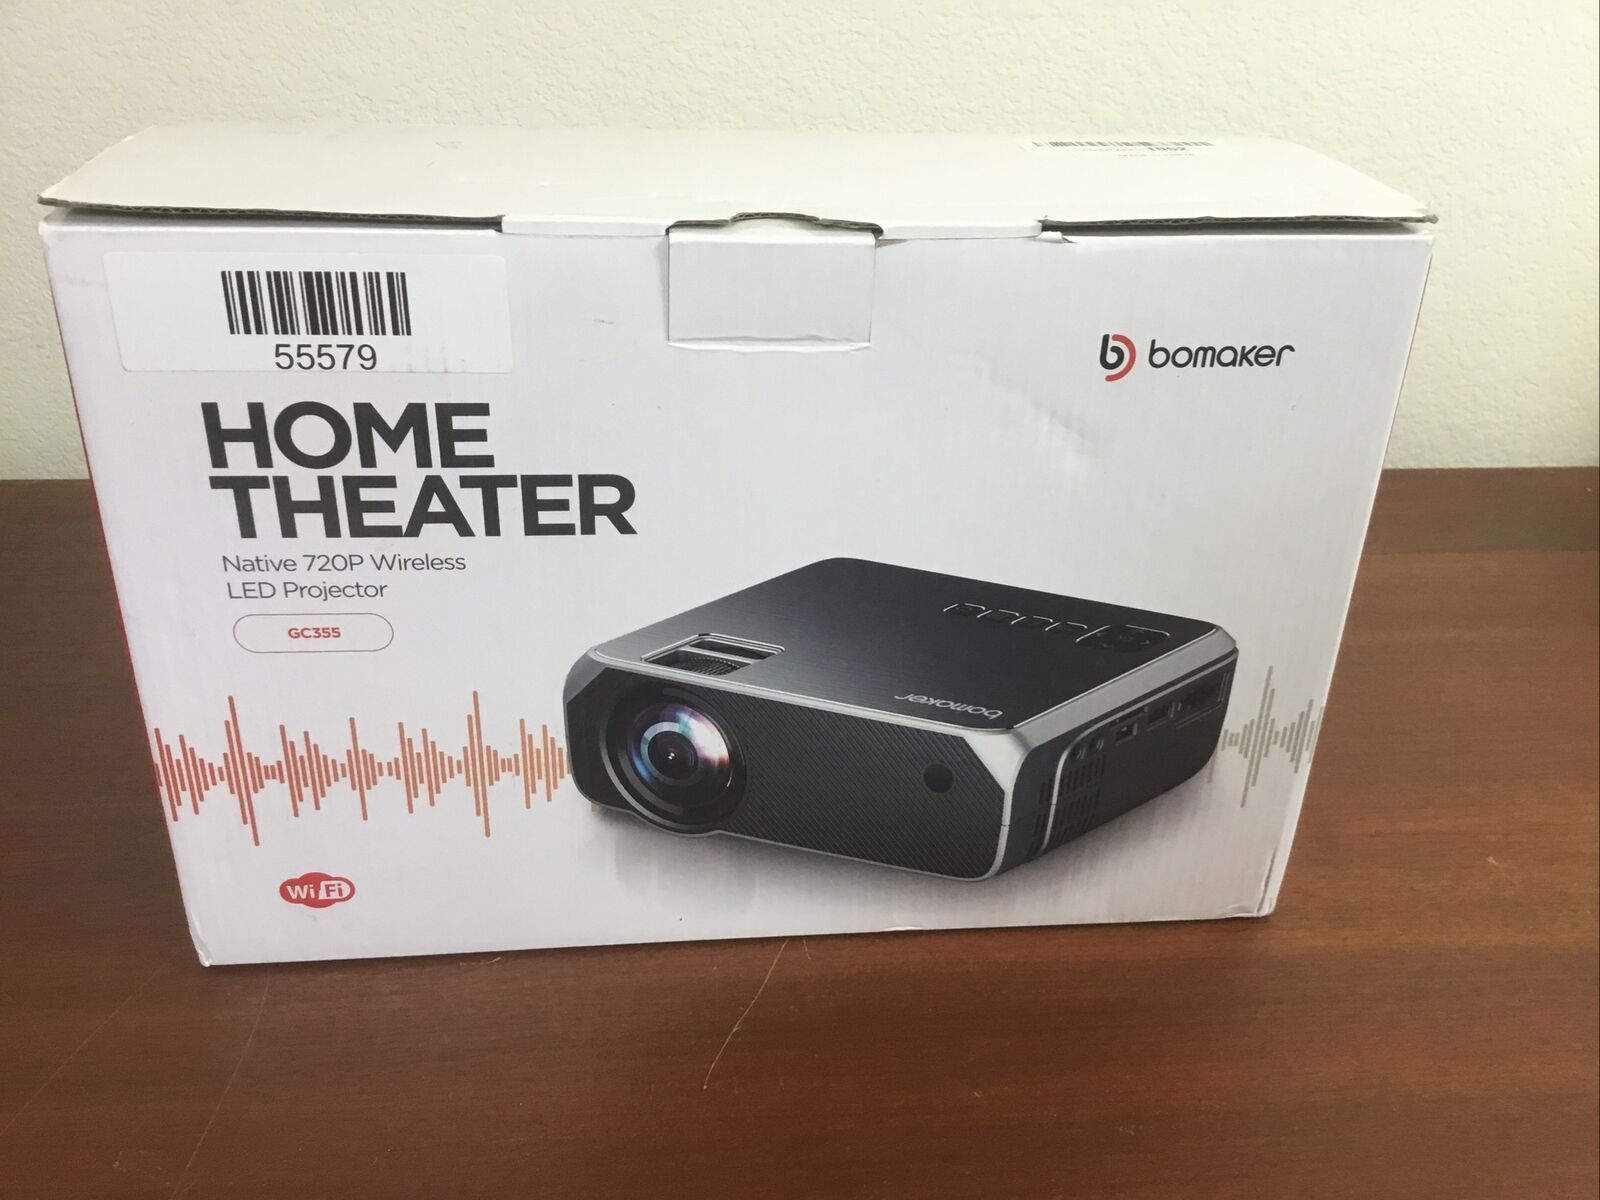 pcurran0429 Bomaker GC355, Wi-Fi Mini Projector(Black)